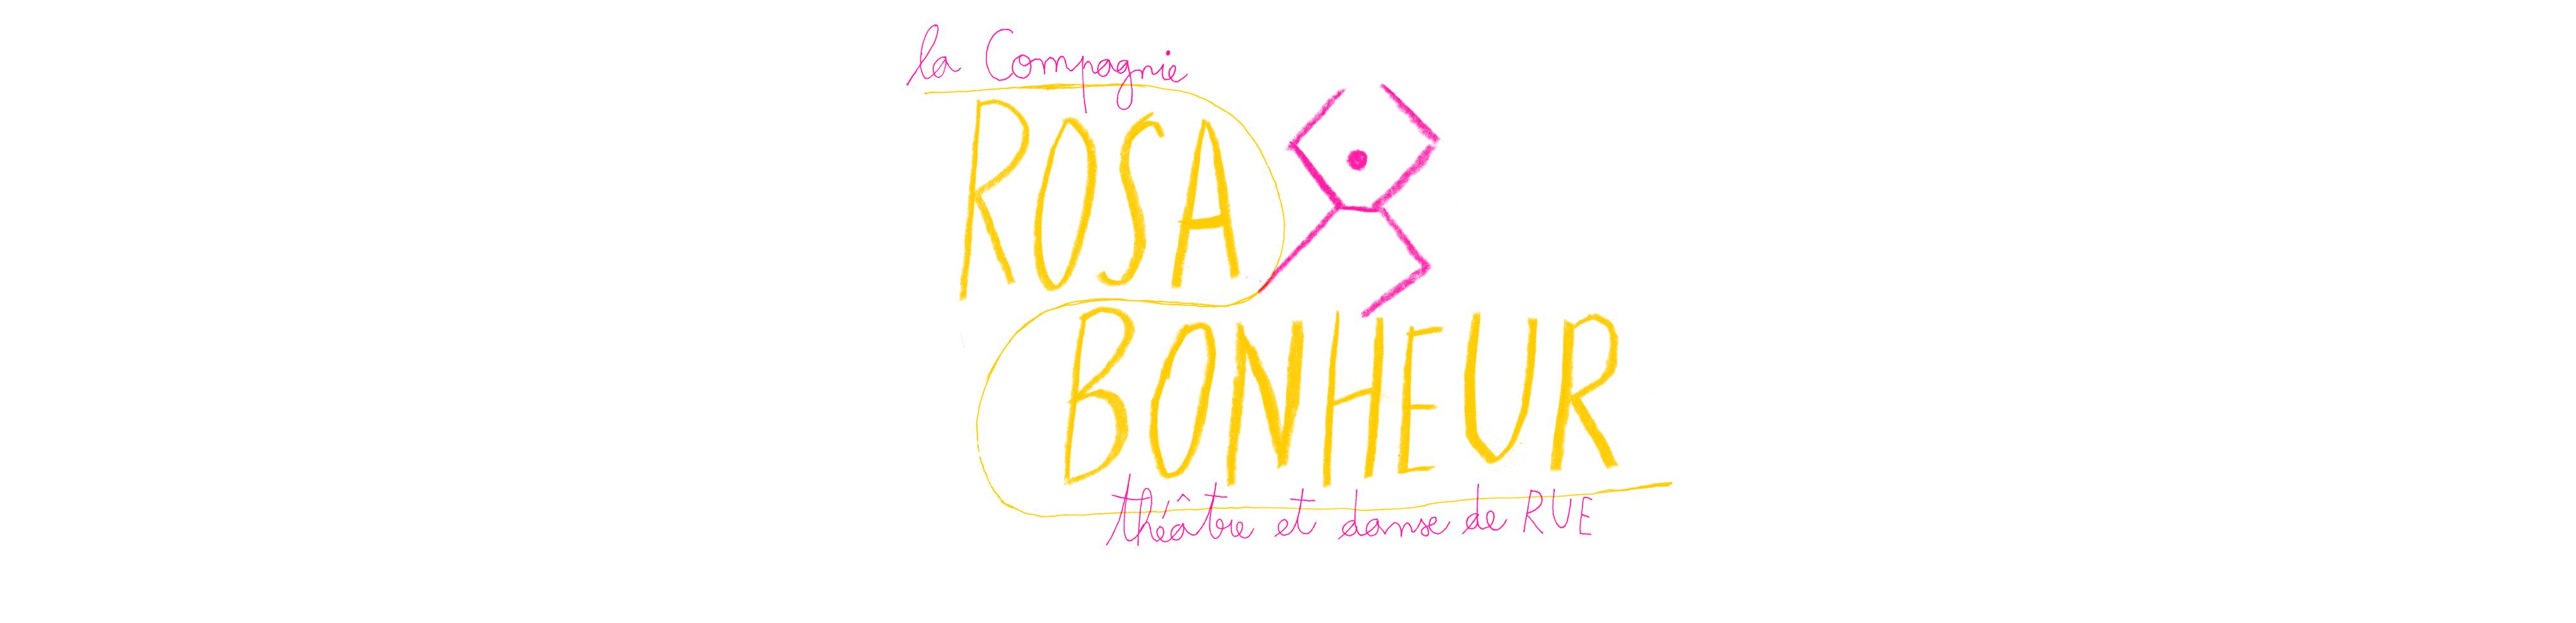 Compagnie Rosa Bonheur